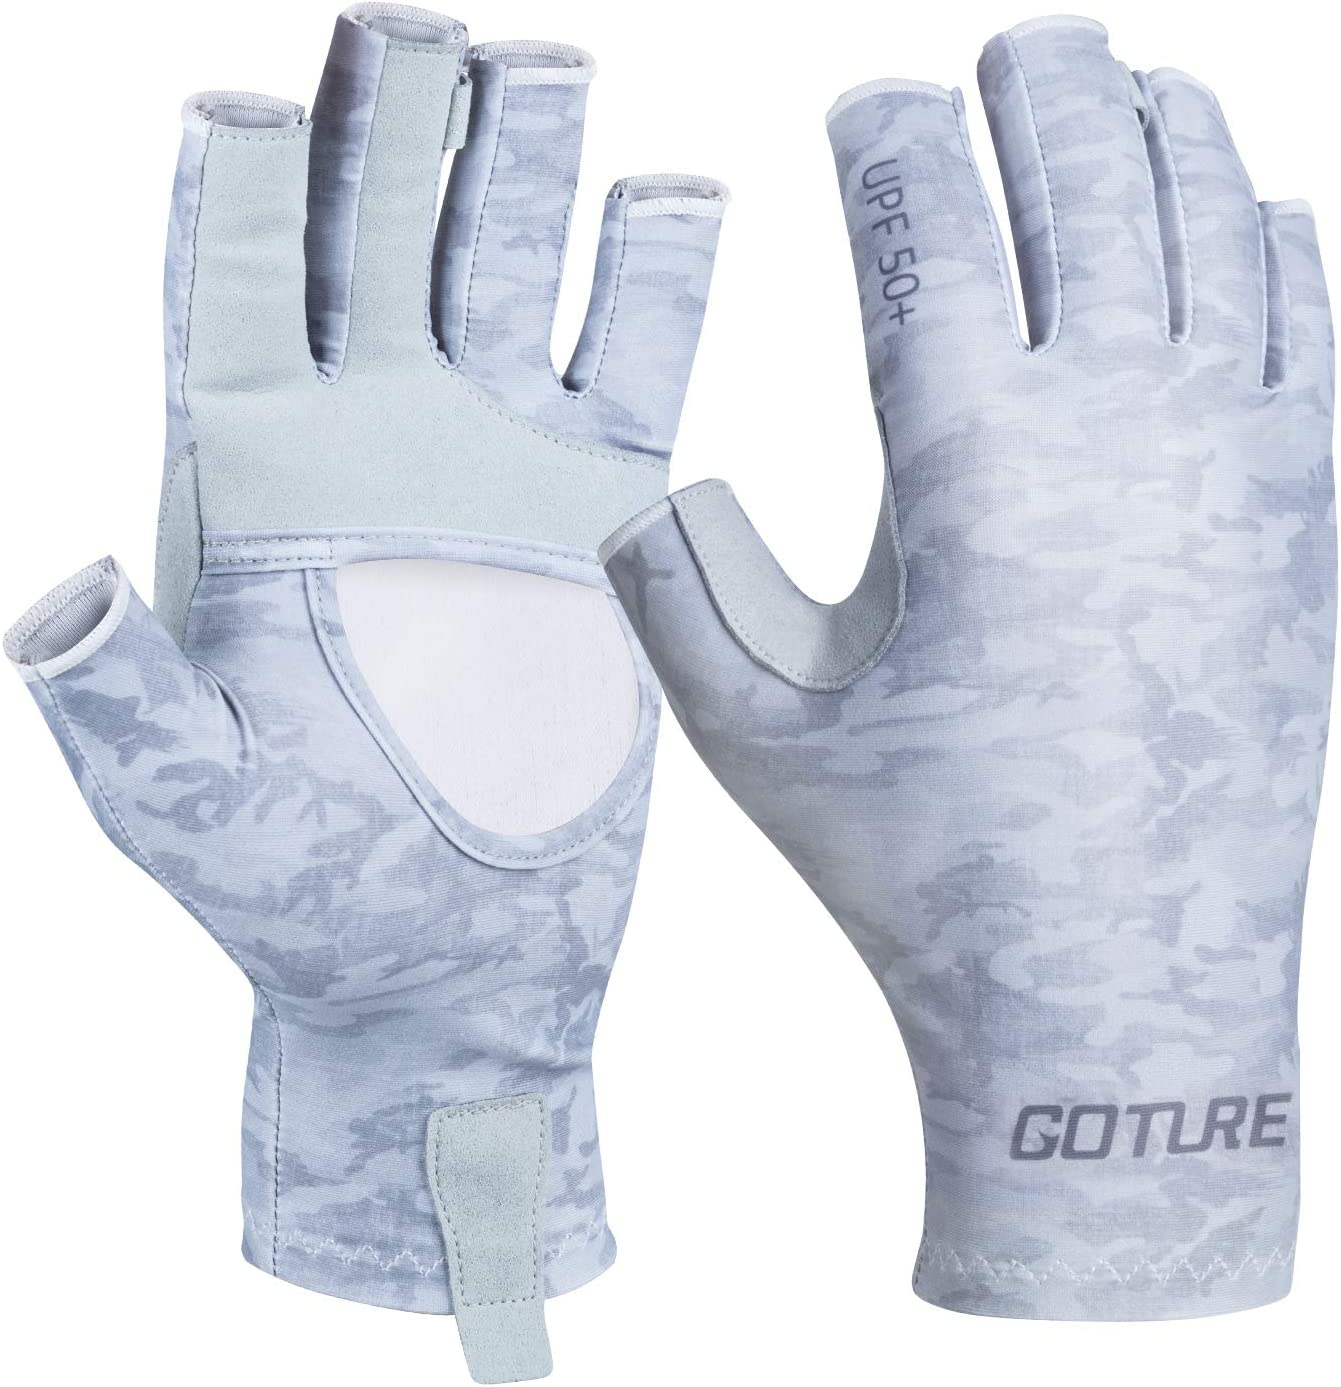 Goture UV Fishing Gloves Men,Sun Protection Fingerless Gloves UPF 50+ Breathable Cooling Gloves for Fishing for Hiking Kayaking Padding Canoeing Rowing(Gray Blue Black S/M L/XL)